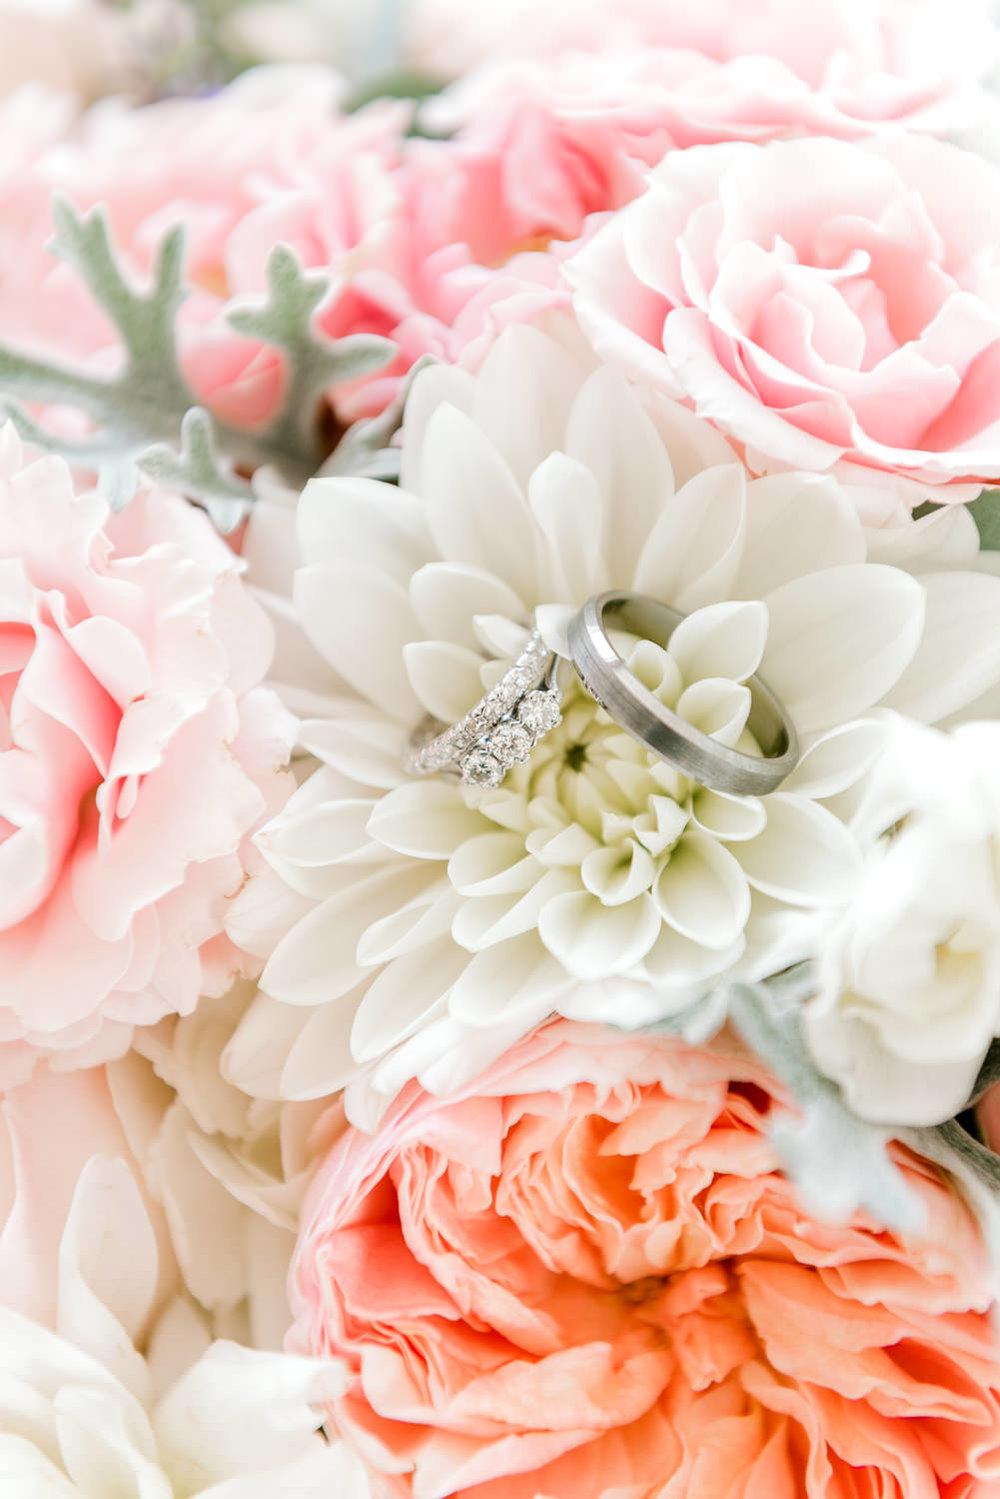 Weddings at Spruce Point Inn Resort & Spa